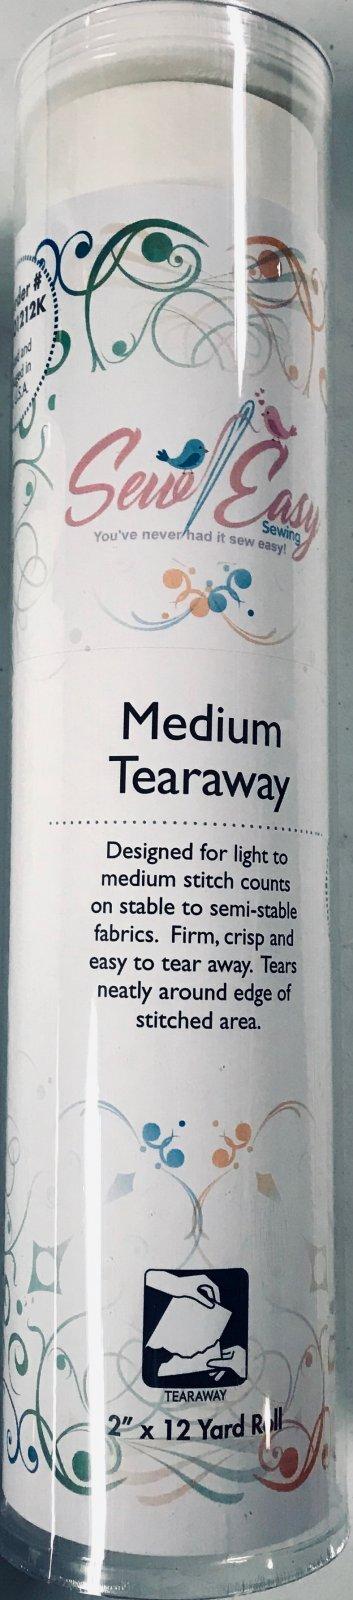 Medium Tearaway Embroidery Stabilizer 12 Inch x 12 Yards